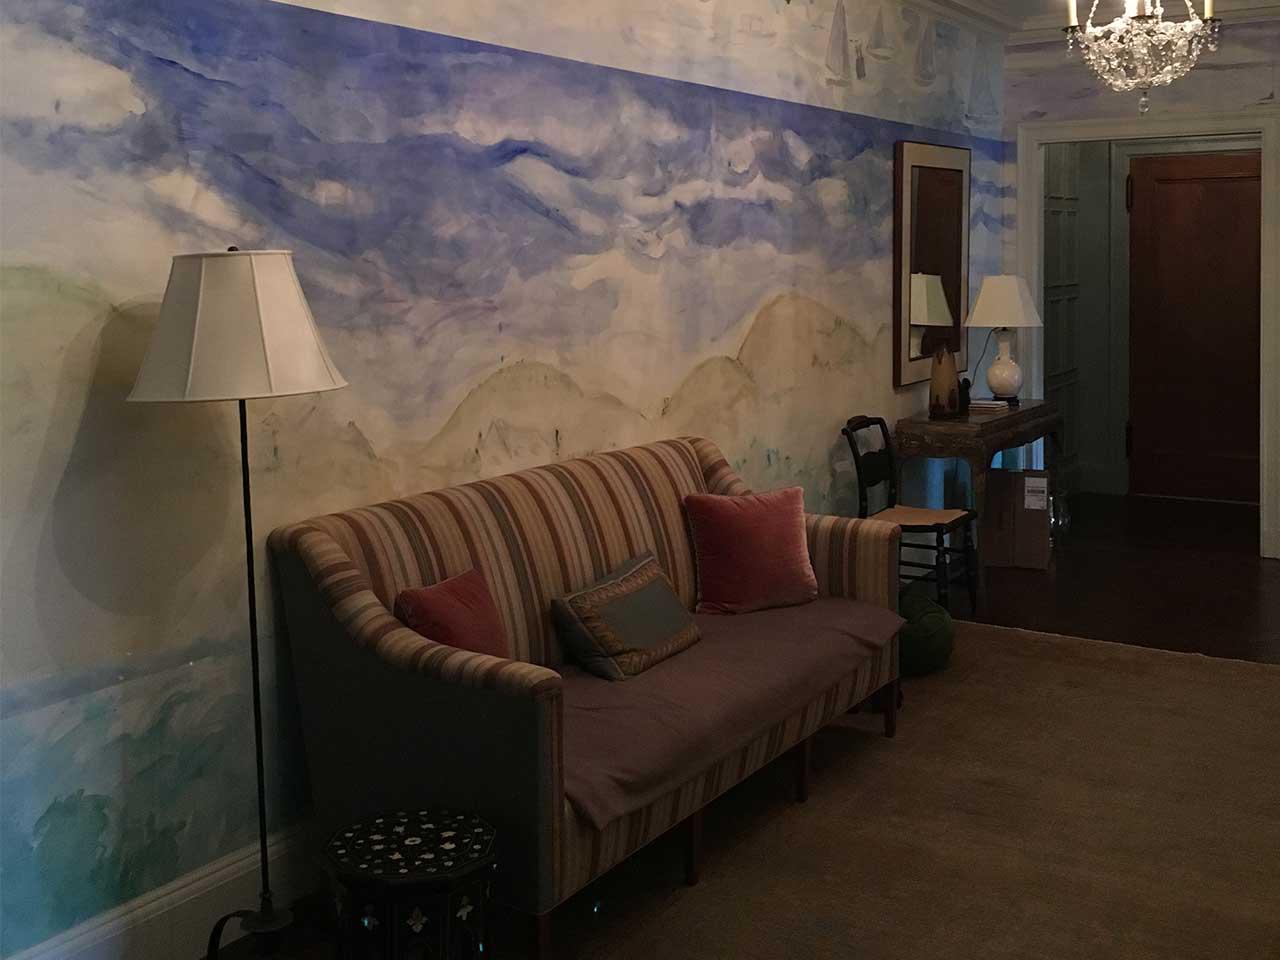 wallpapering-room-landscape